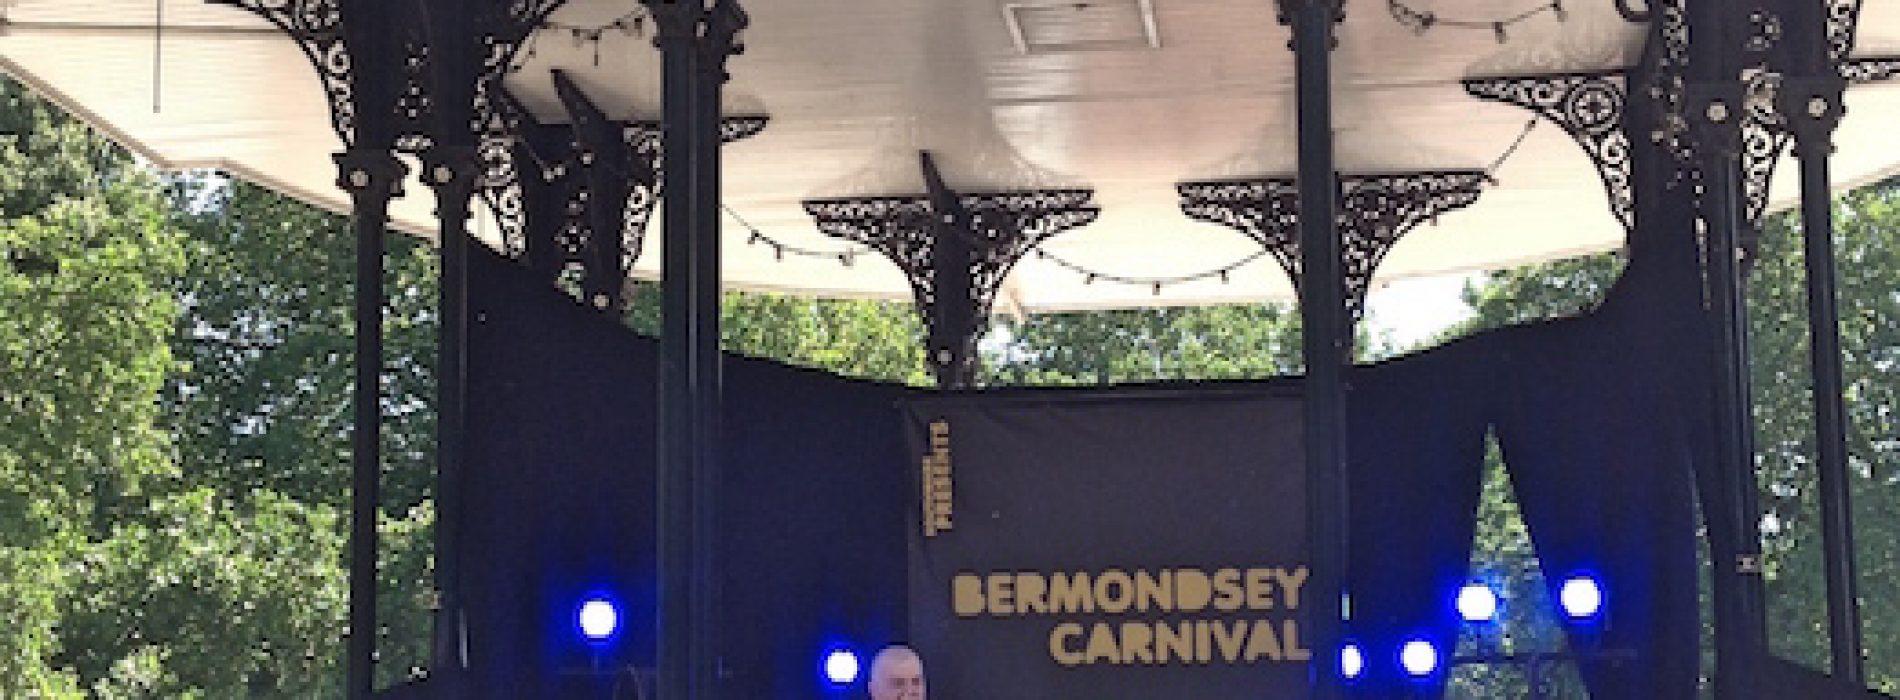 Bermondsey Carnival 2018 Photo Gallery